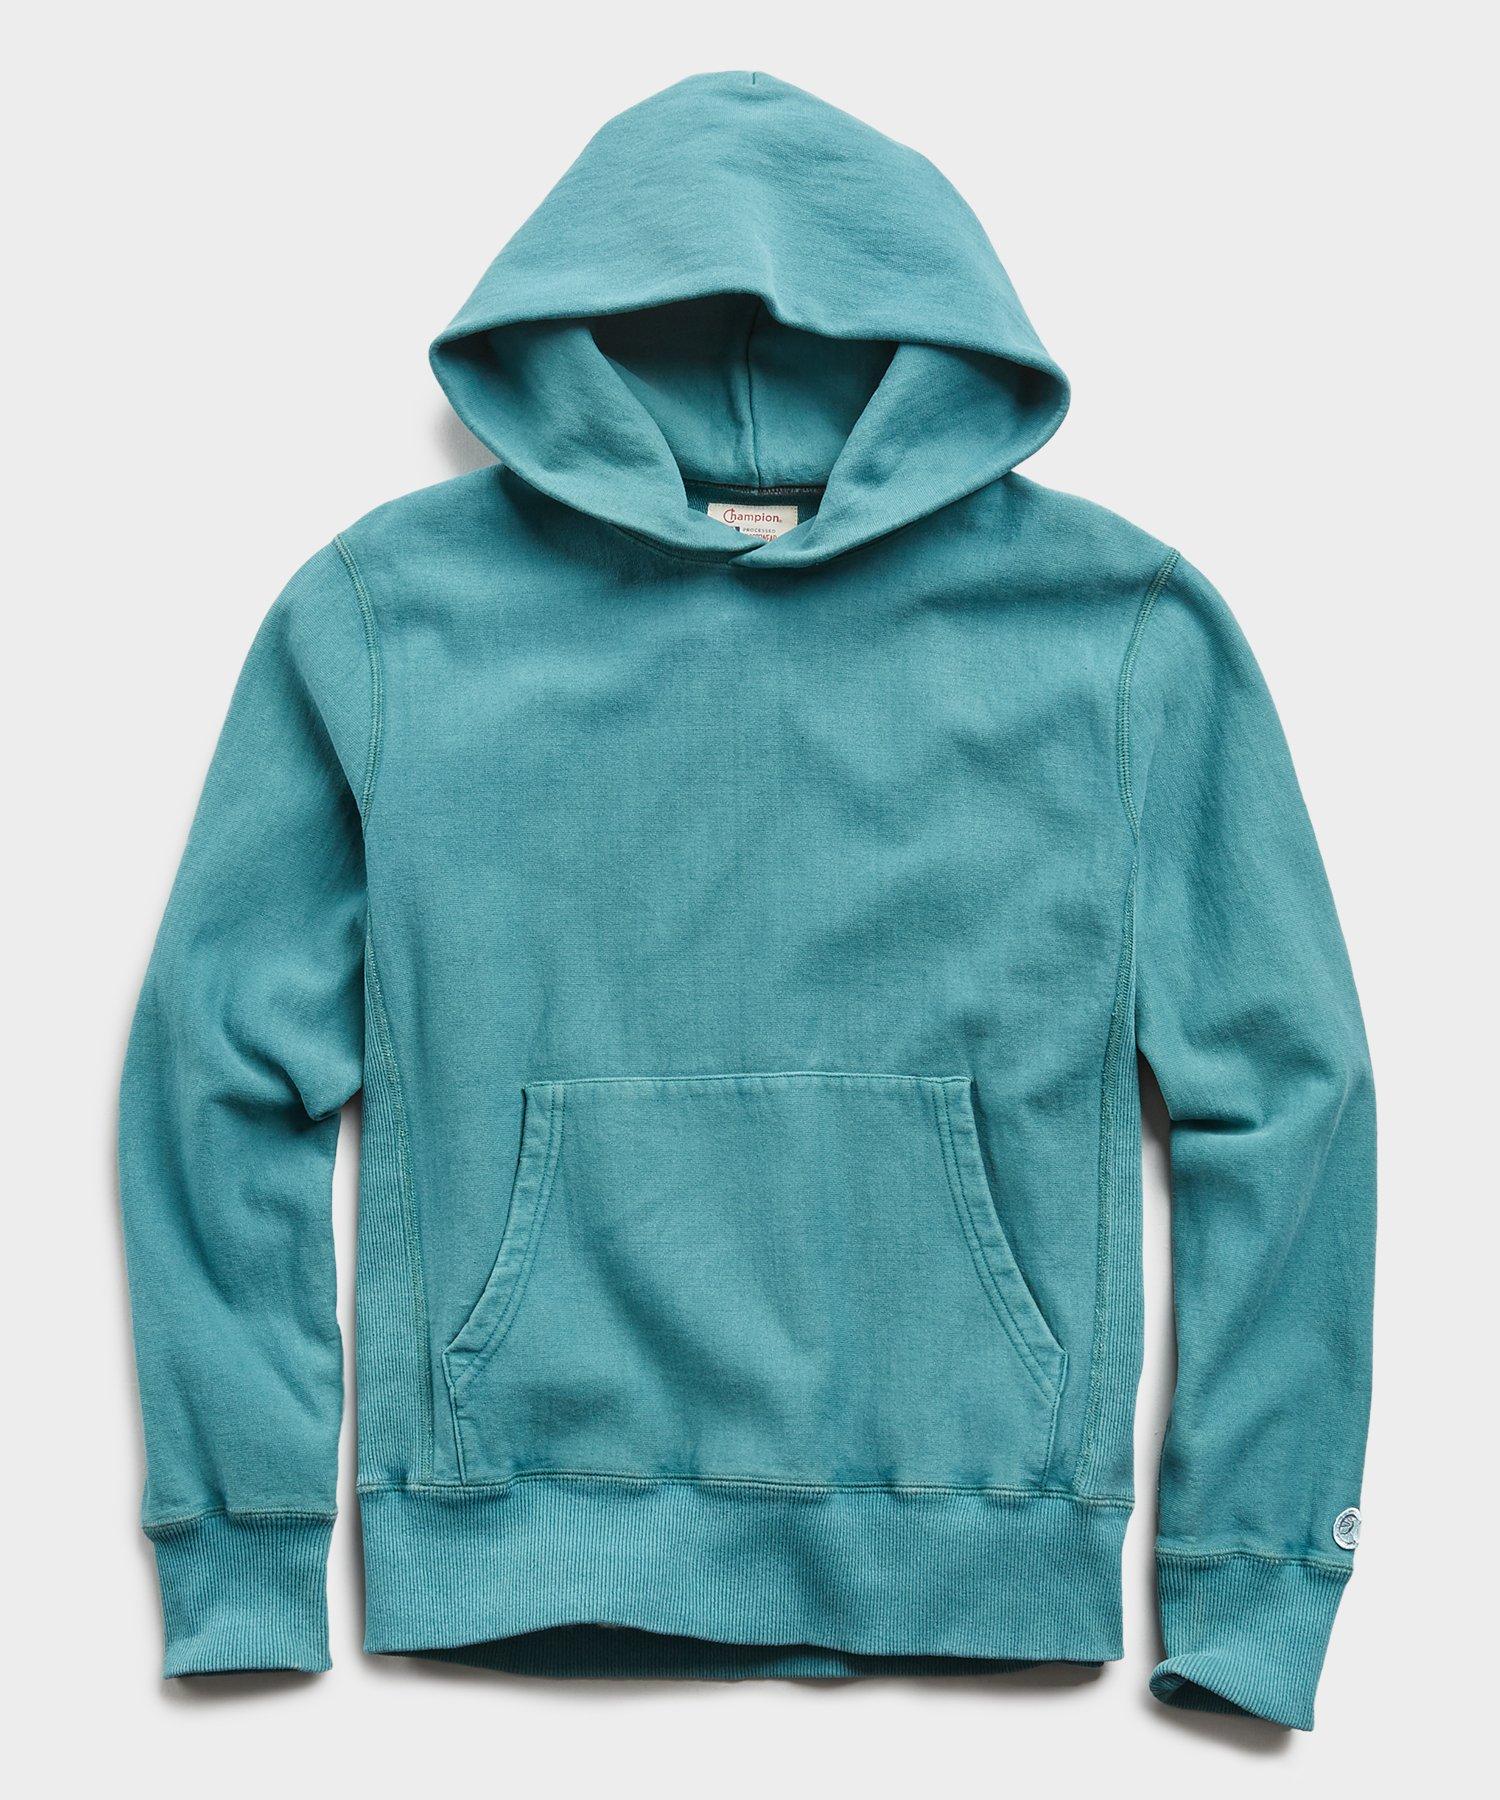 Lightweight Popover Hoodie Sweatshirt in Artichoke